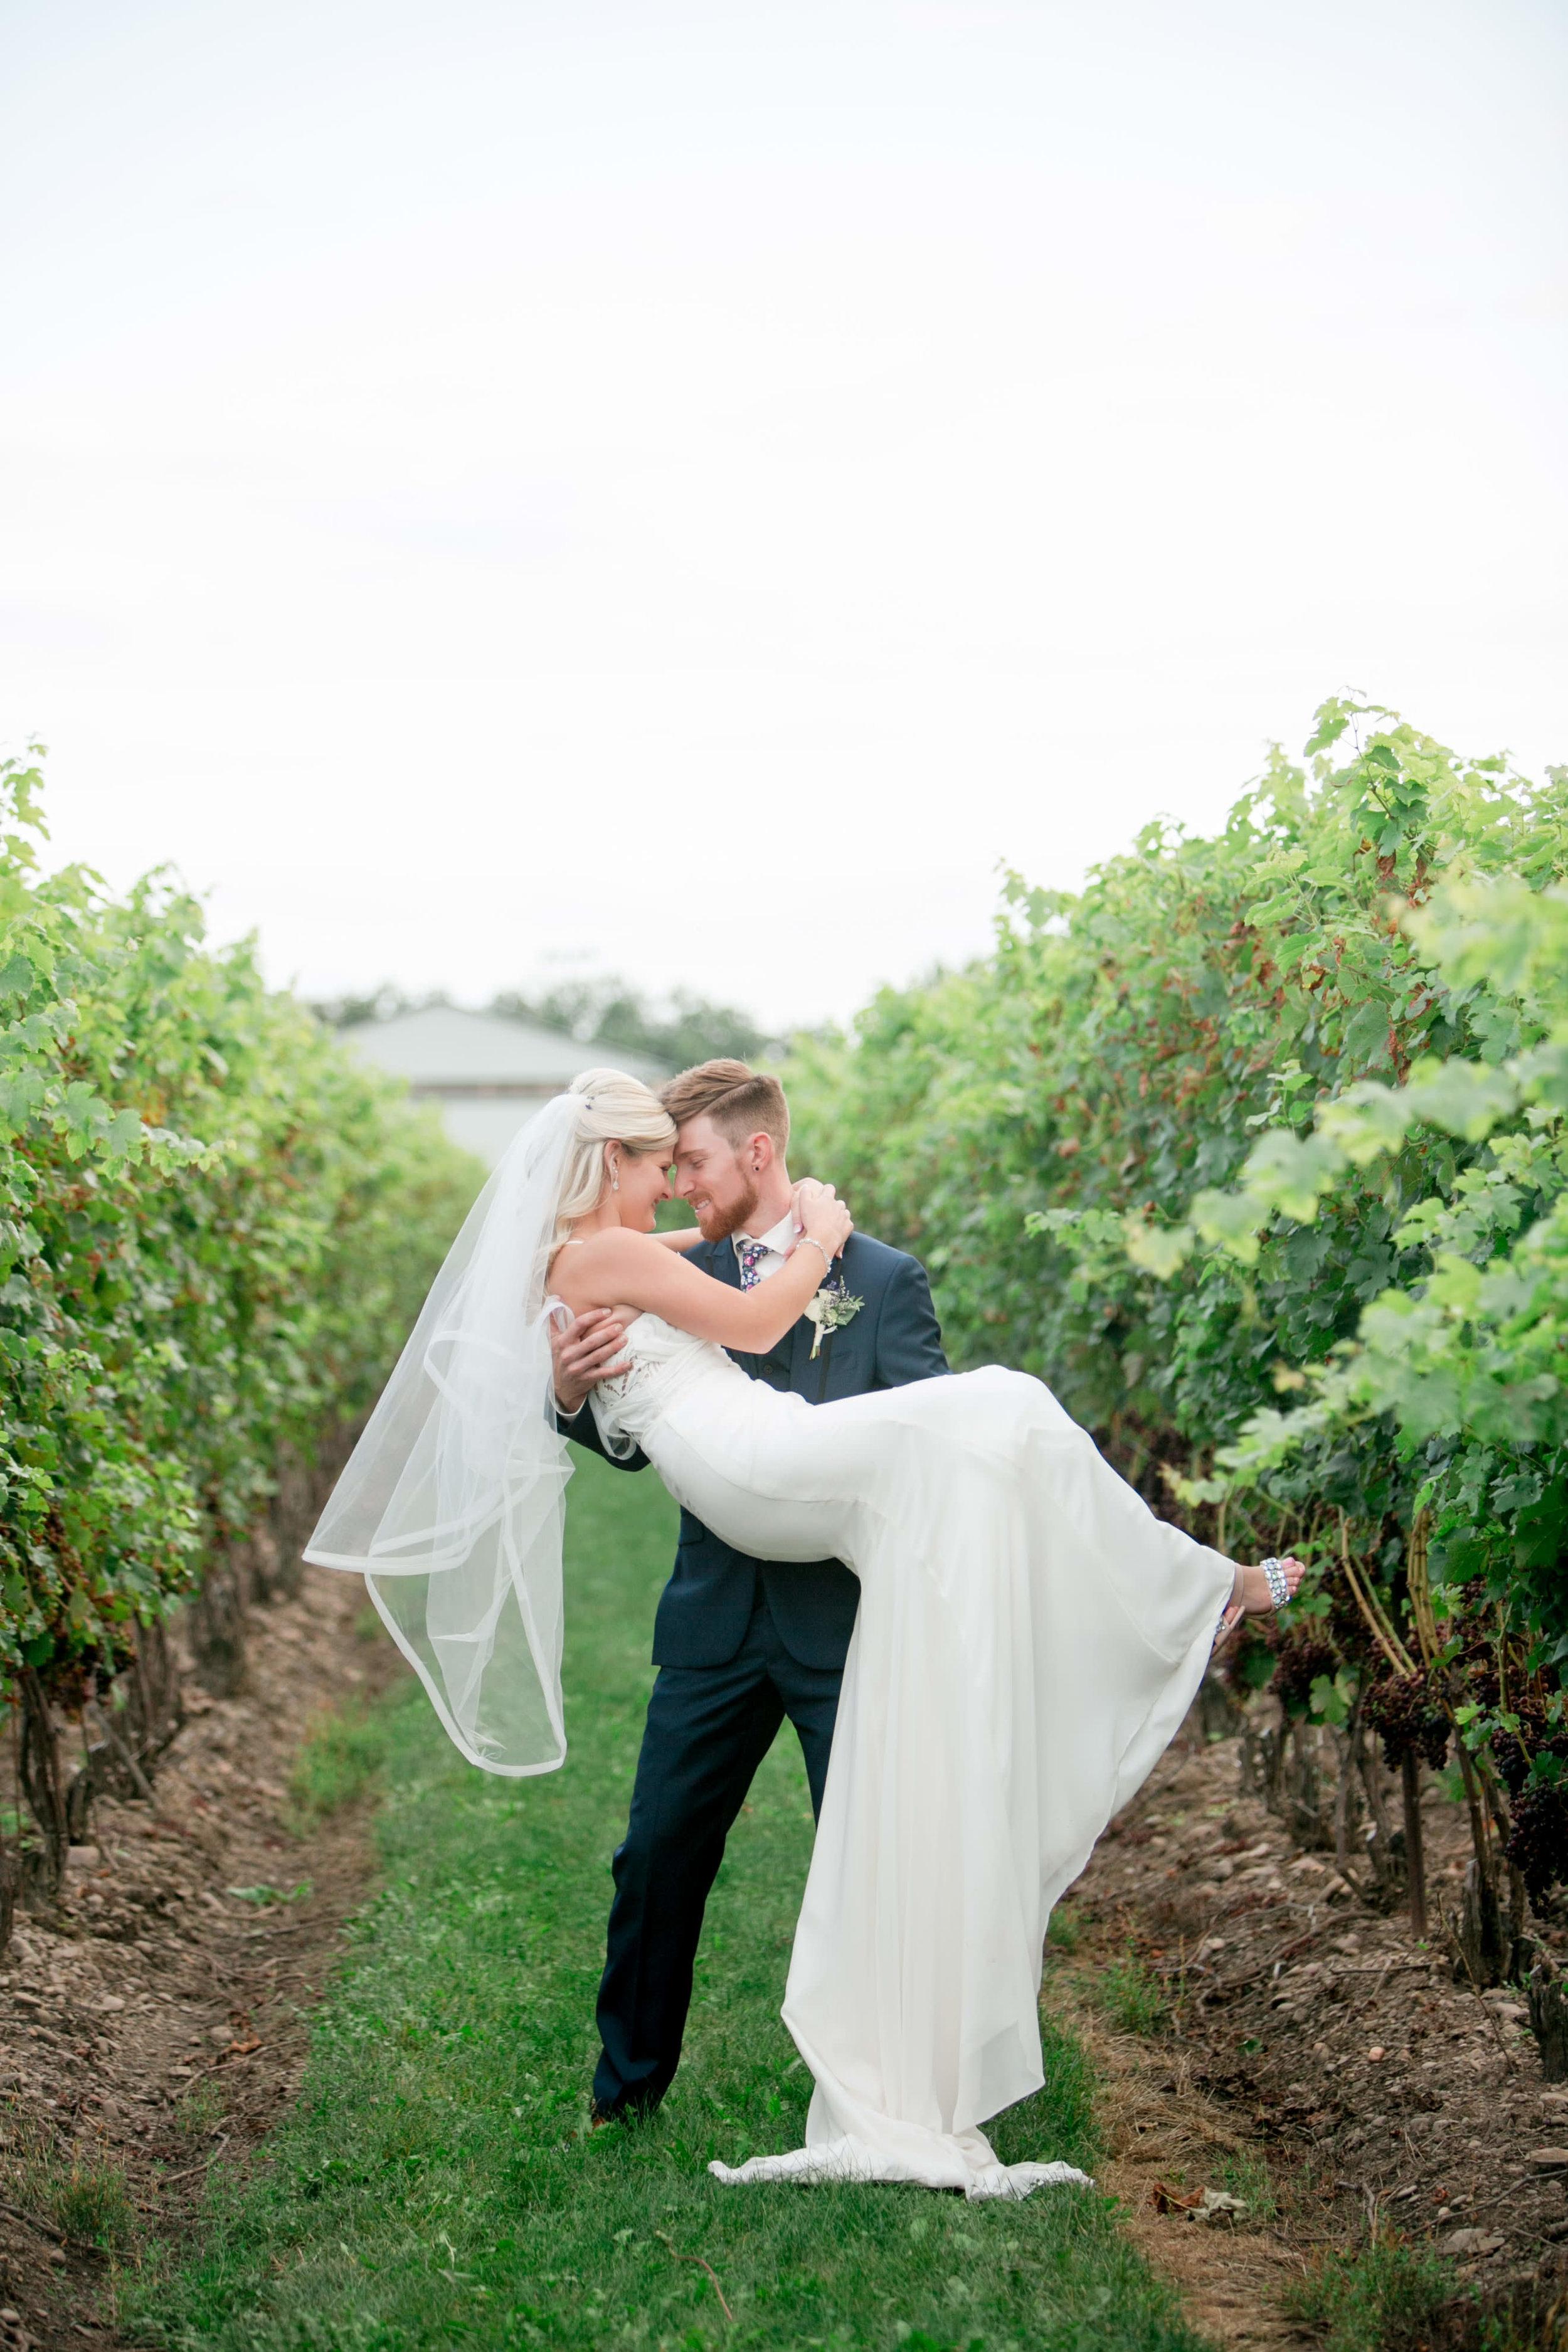 Maddy___Brandon___Daniel_Ricci_Weddings_High_Res._Finals_475.jpg